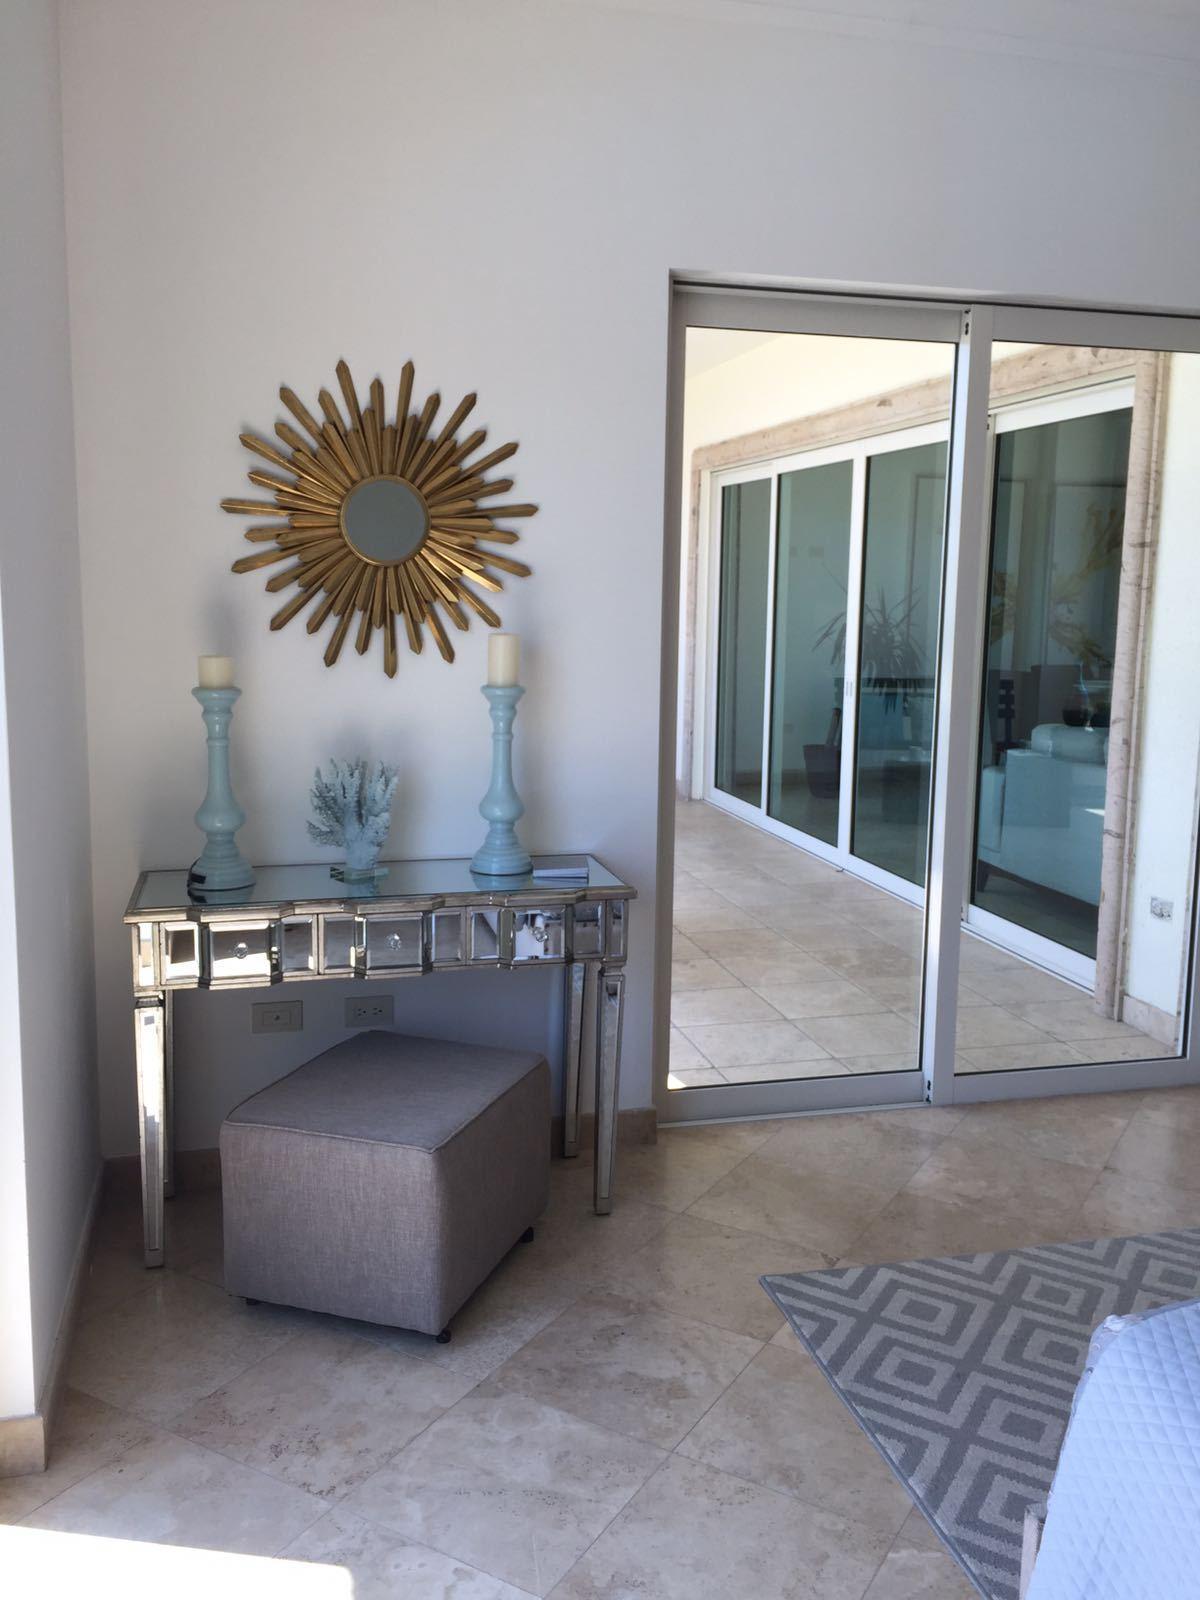 Puerta Cabos Village Level 4-6